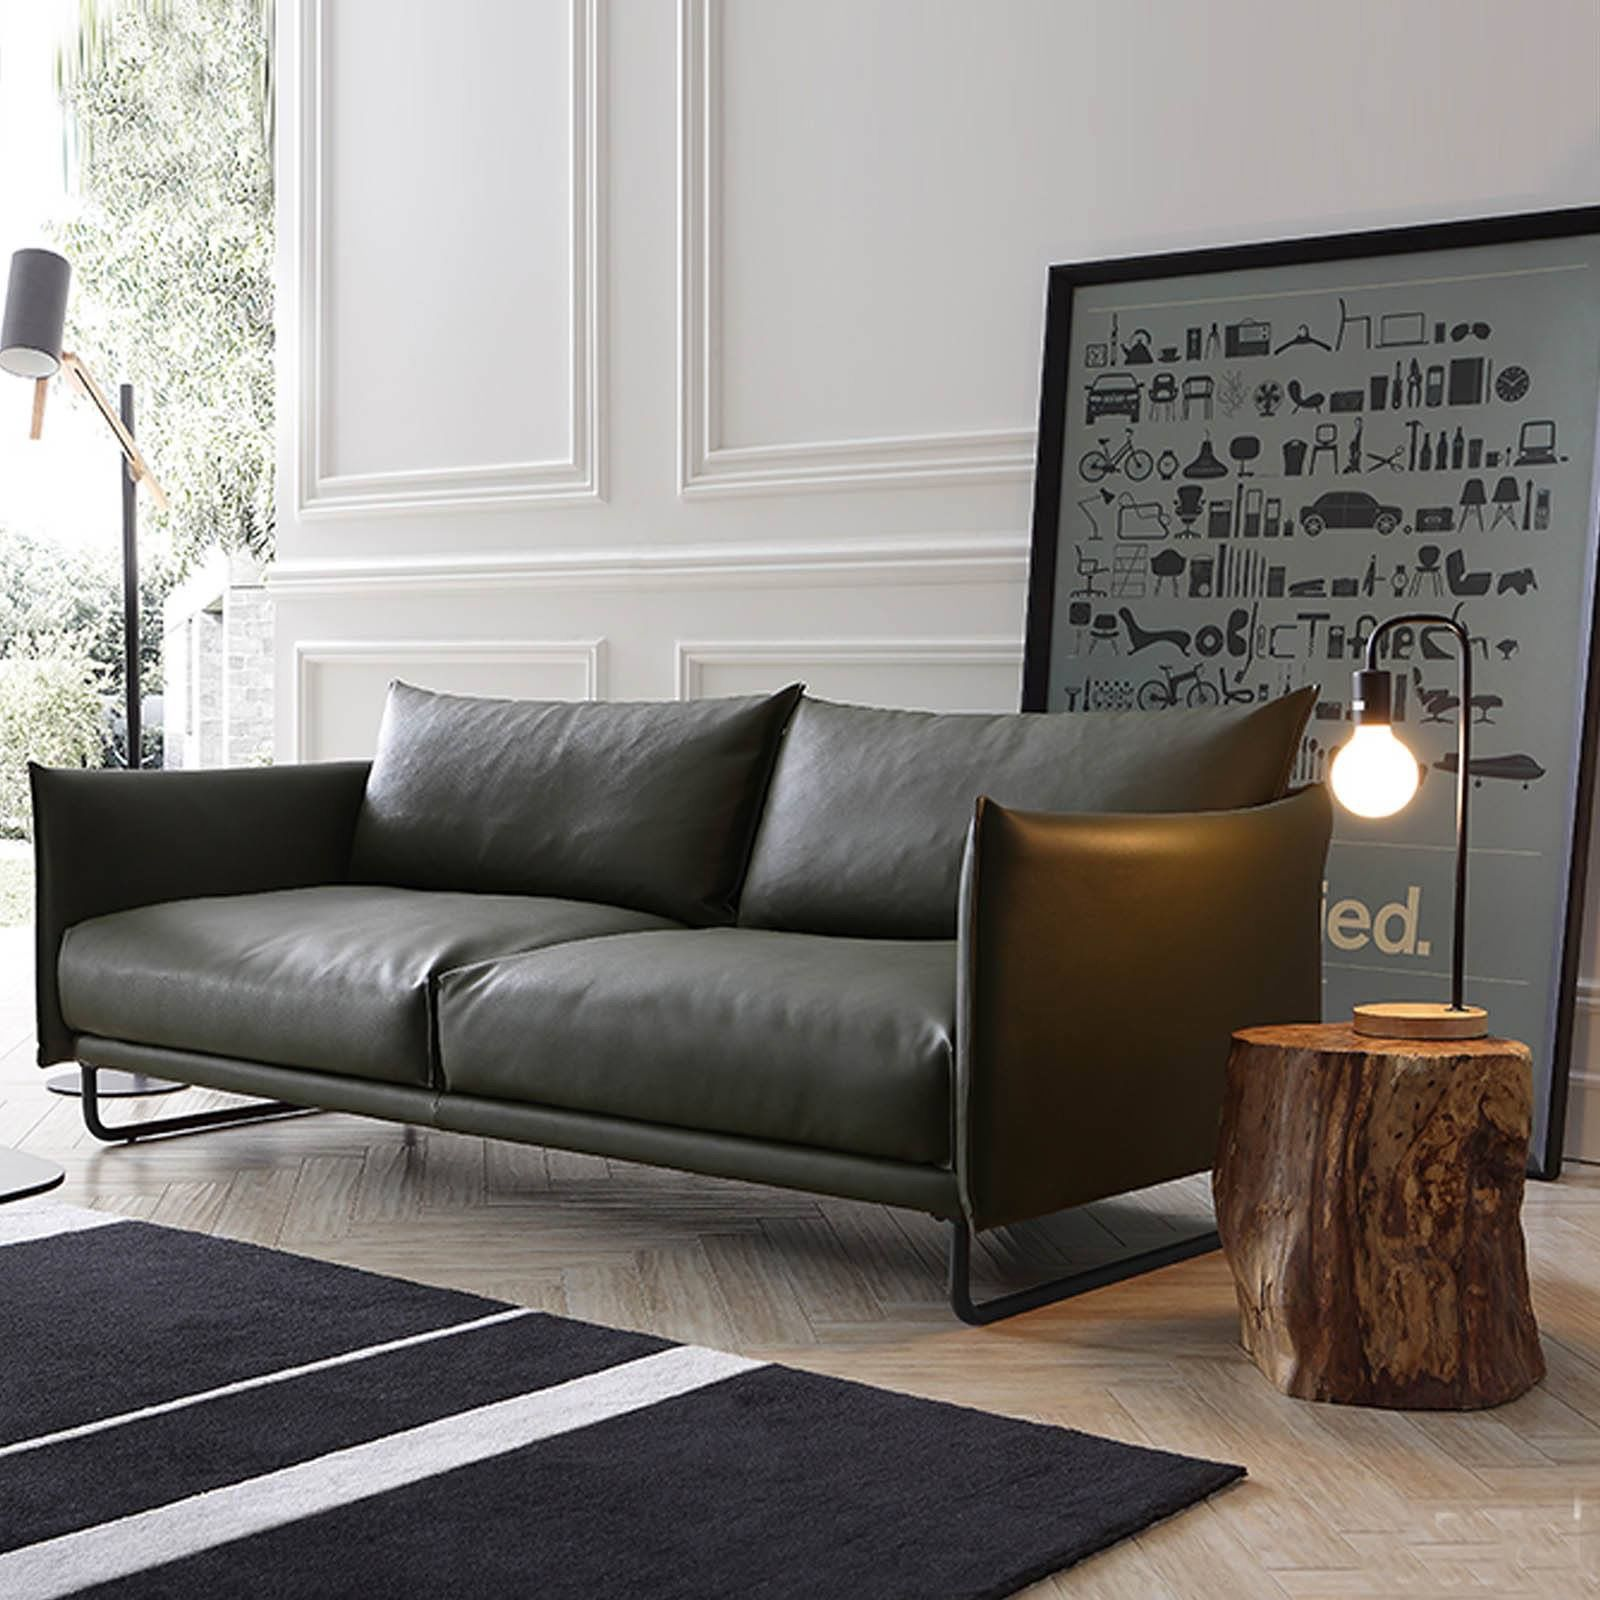 Pin by Sonia Saquib on Around house Classic sofa, Sofa